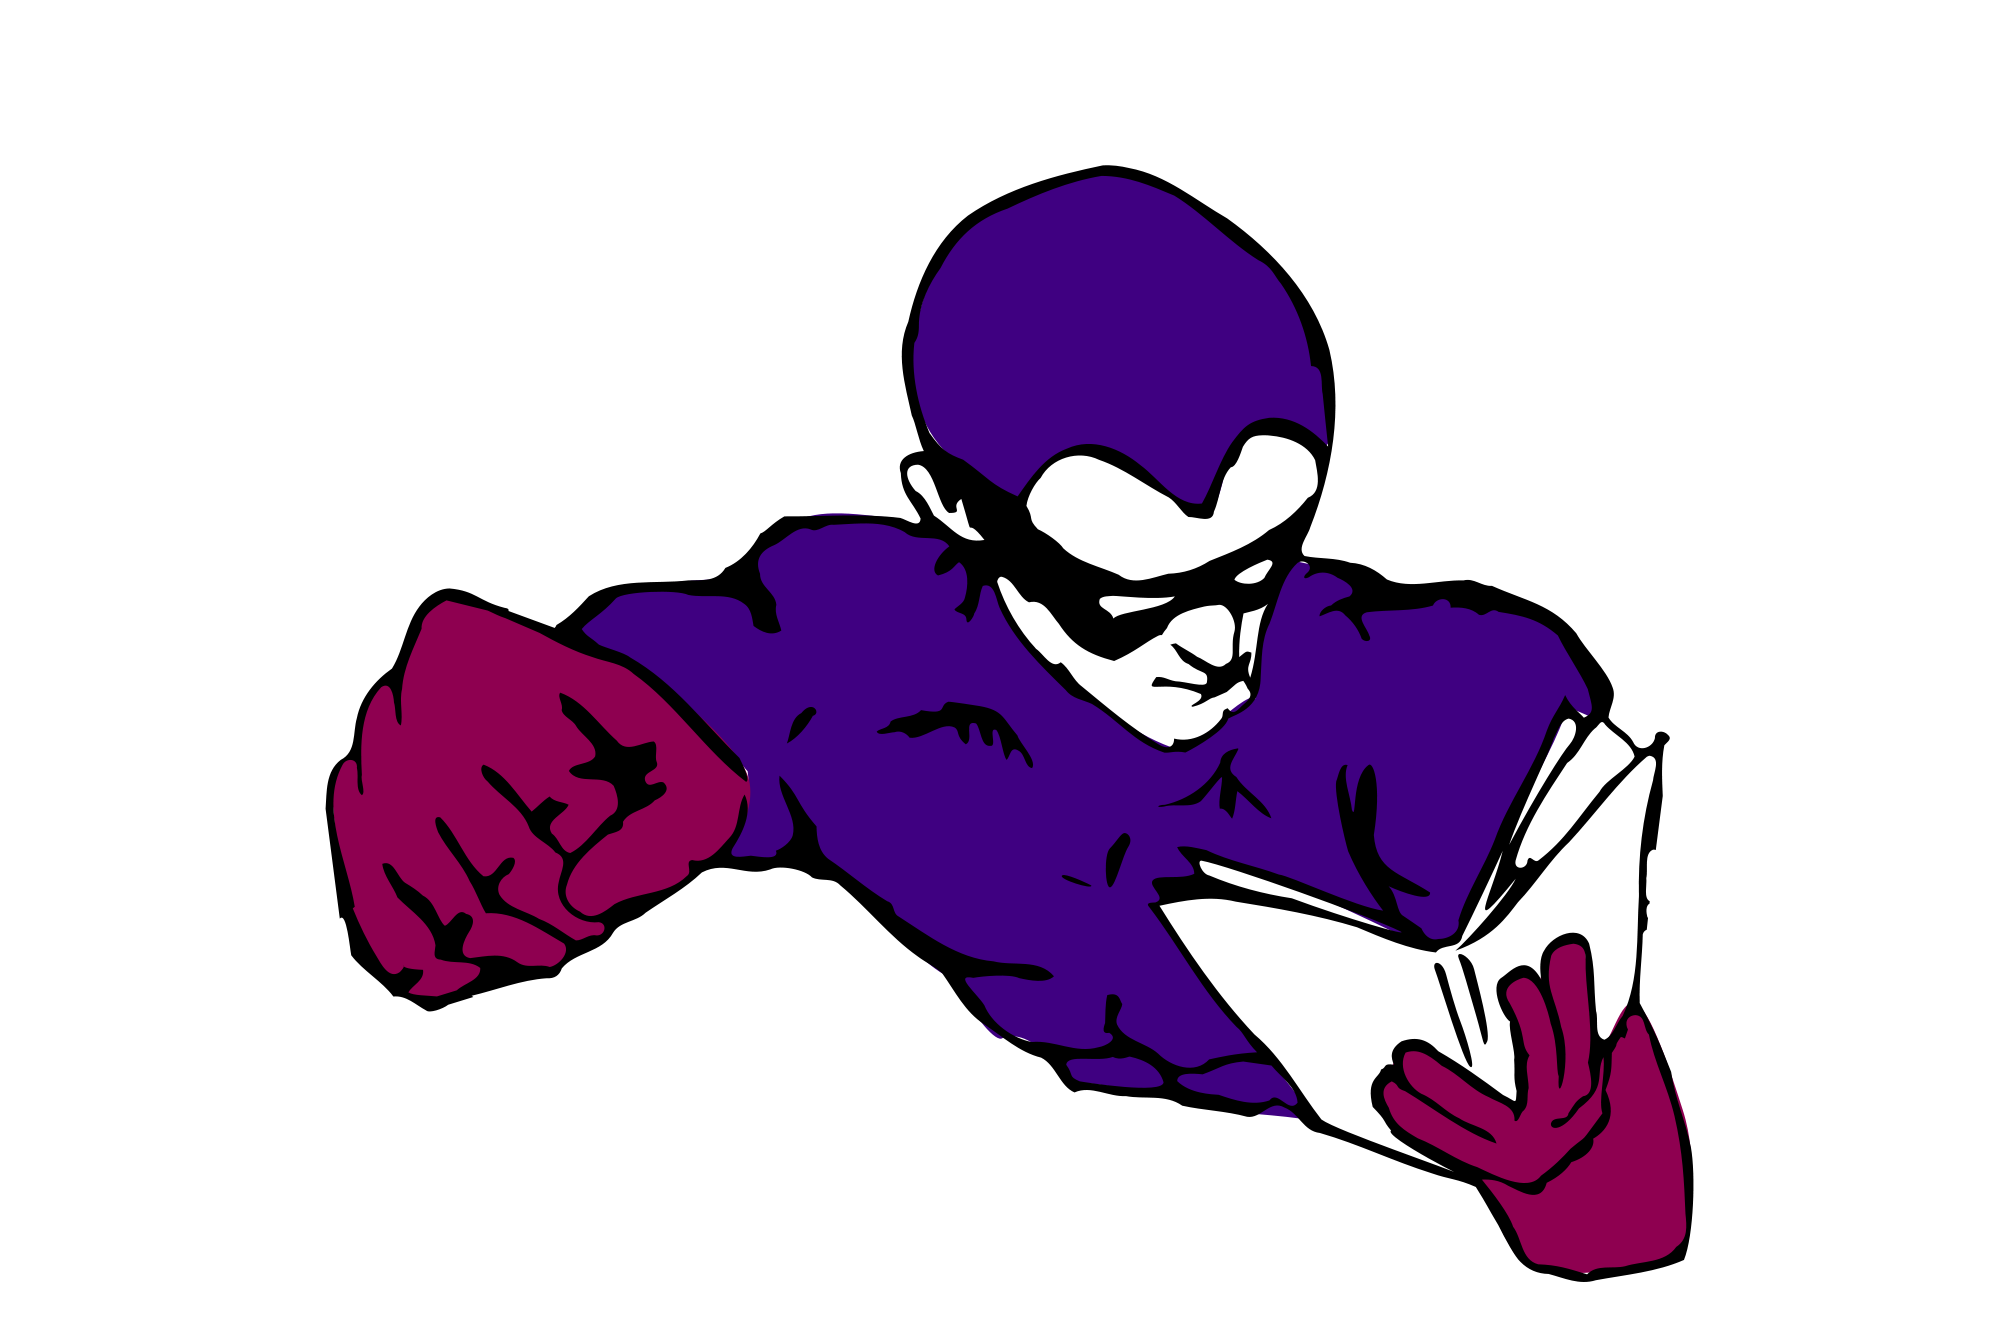 clipart transparent library portal drawing superhero #101568154